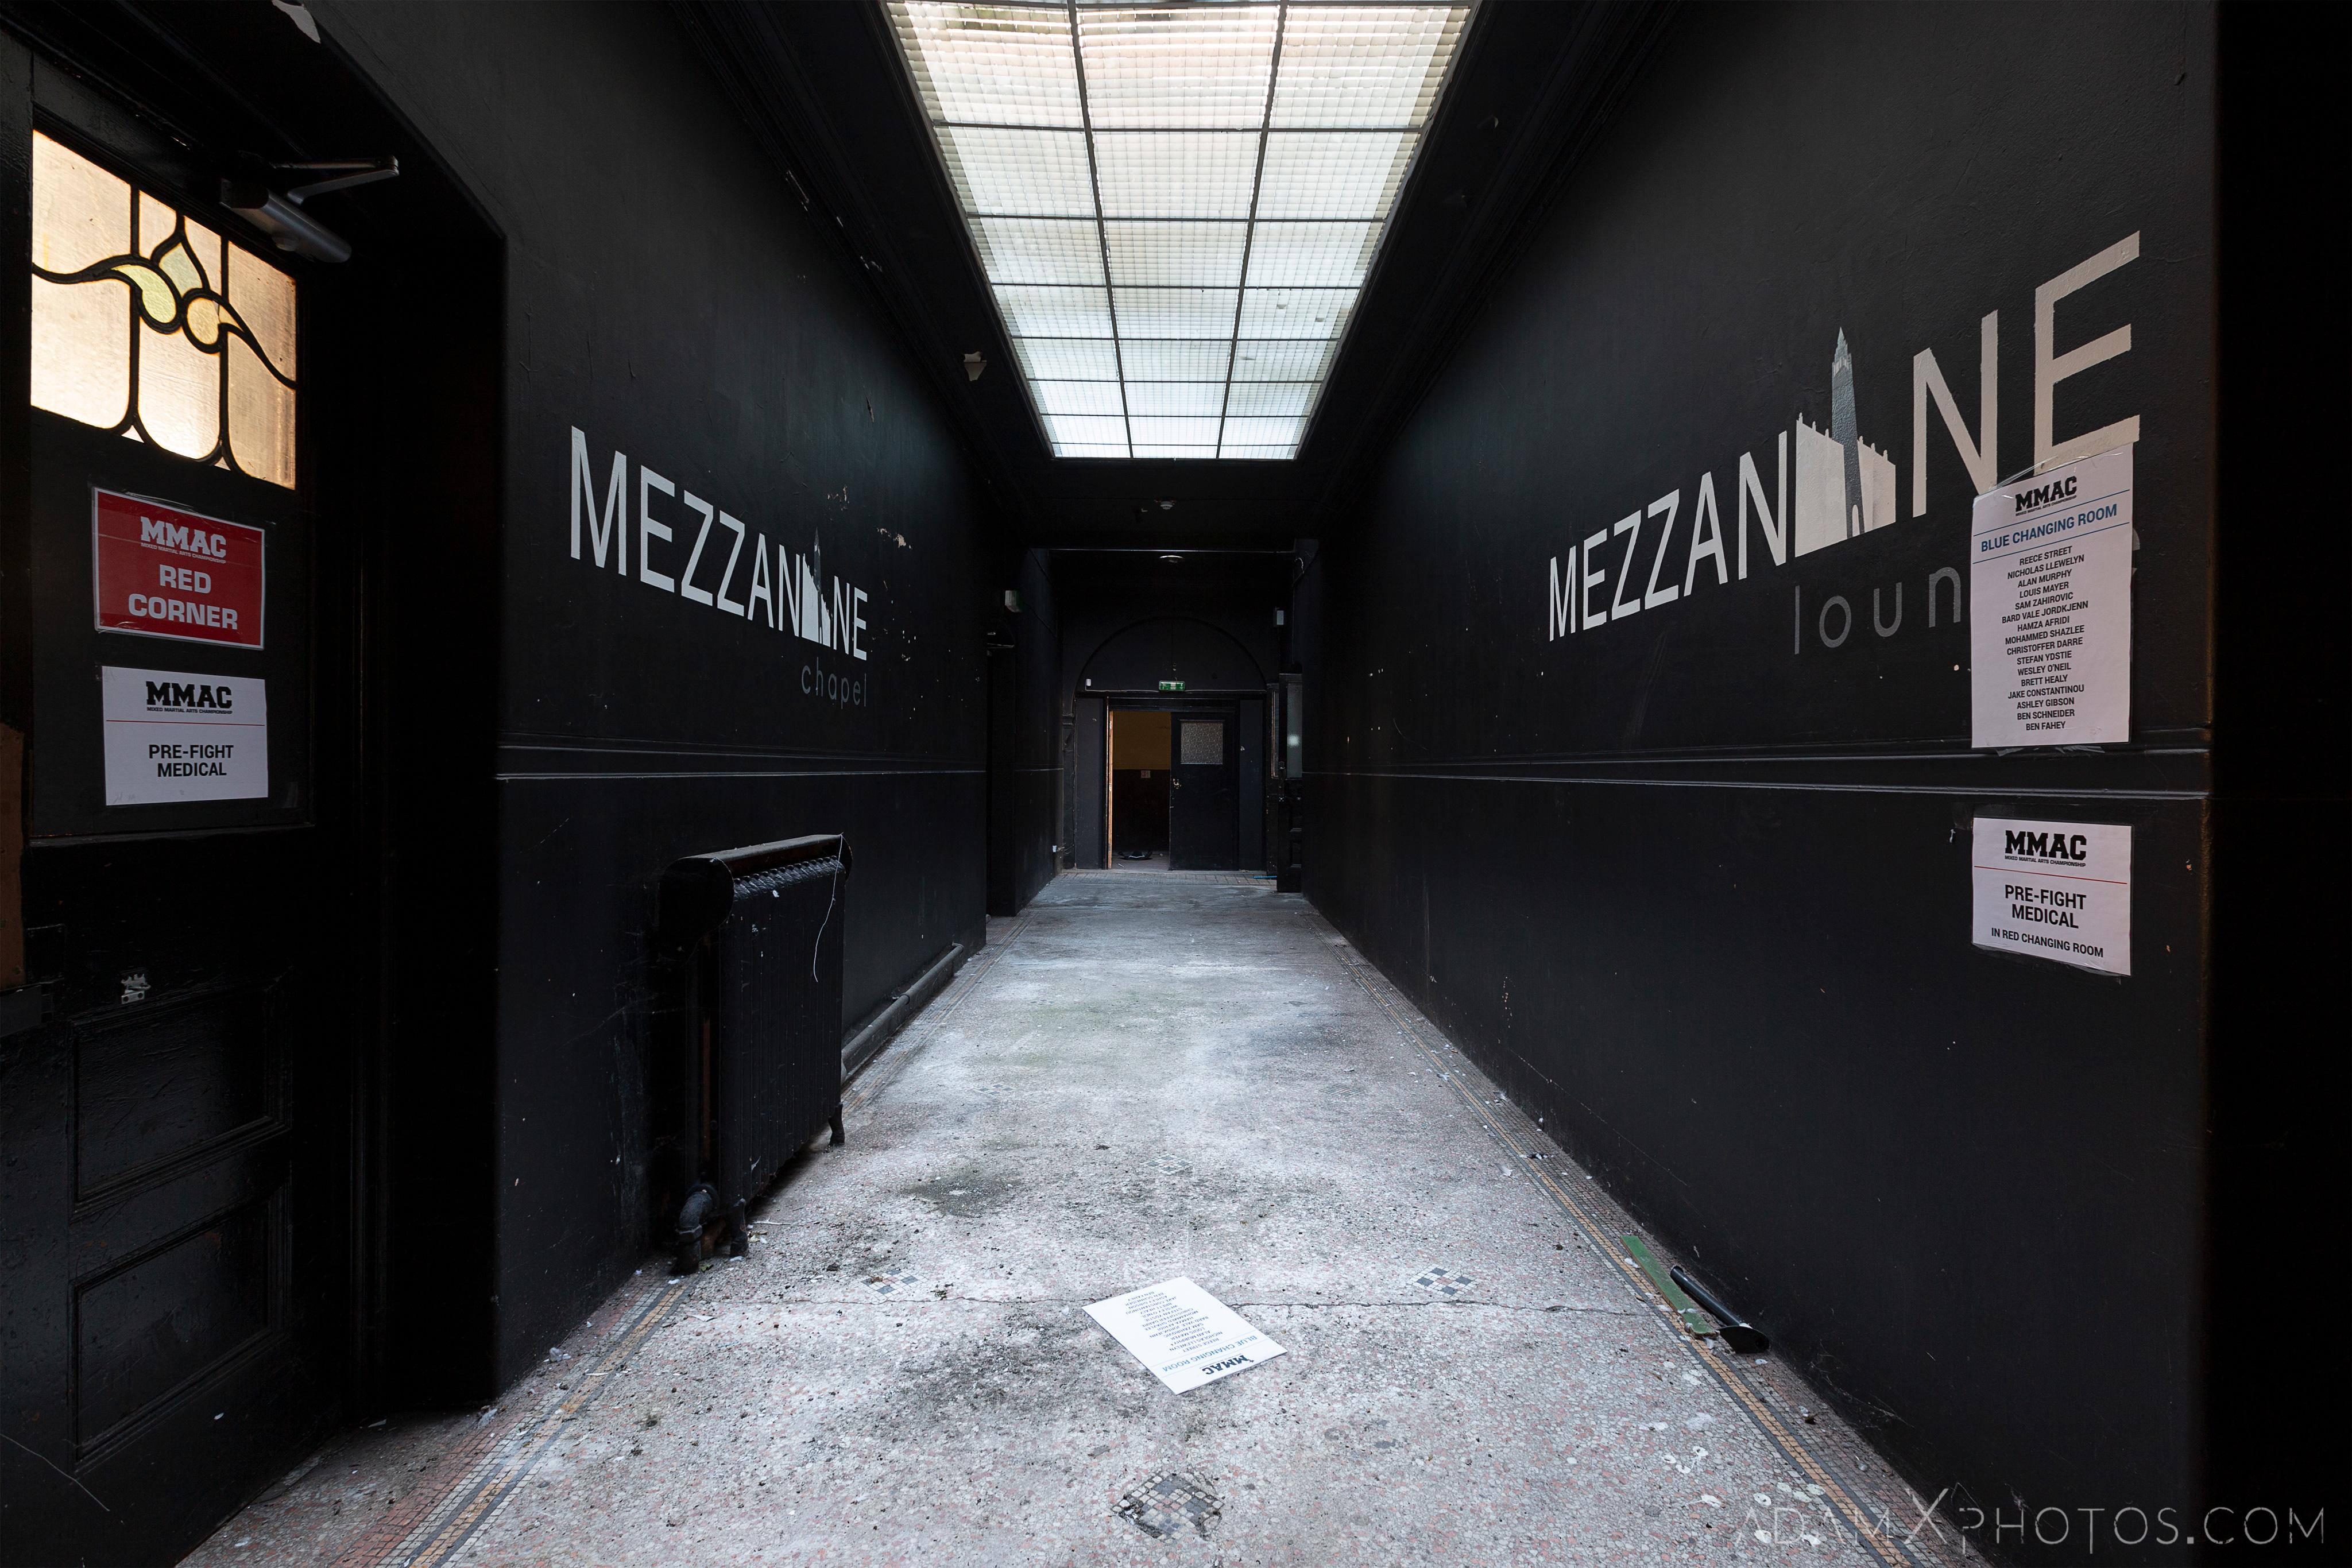 mezzainine corridor skylight MMAC Birmingham Methodist Central Hall Q Club Adam X Urbex Urban Exploration Access 2018 Abandoned decay lost forgotten derelict location creepy haunting eerie